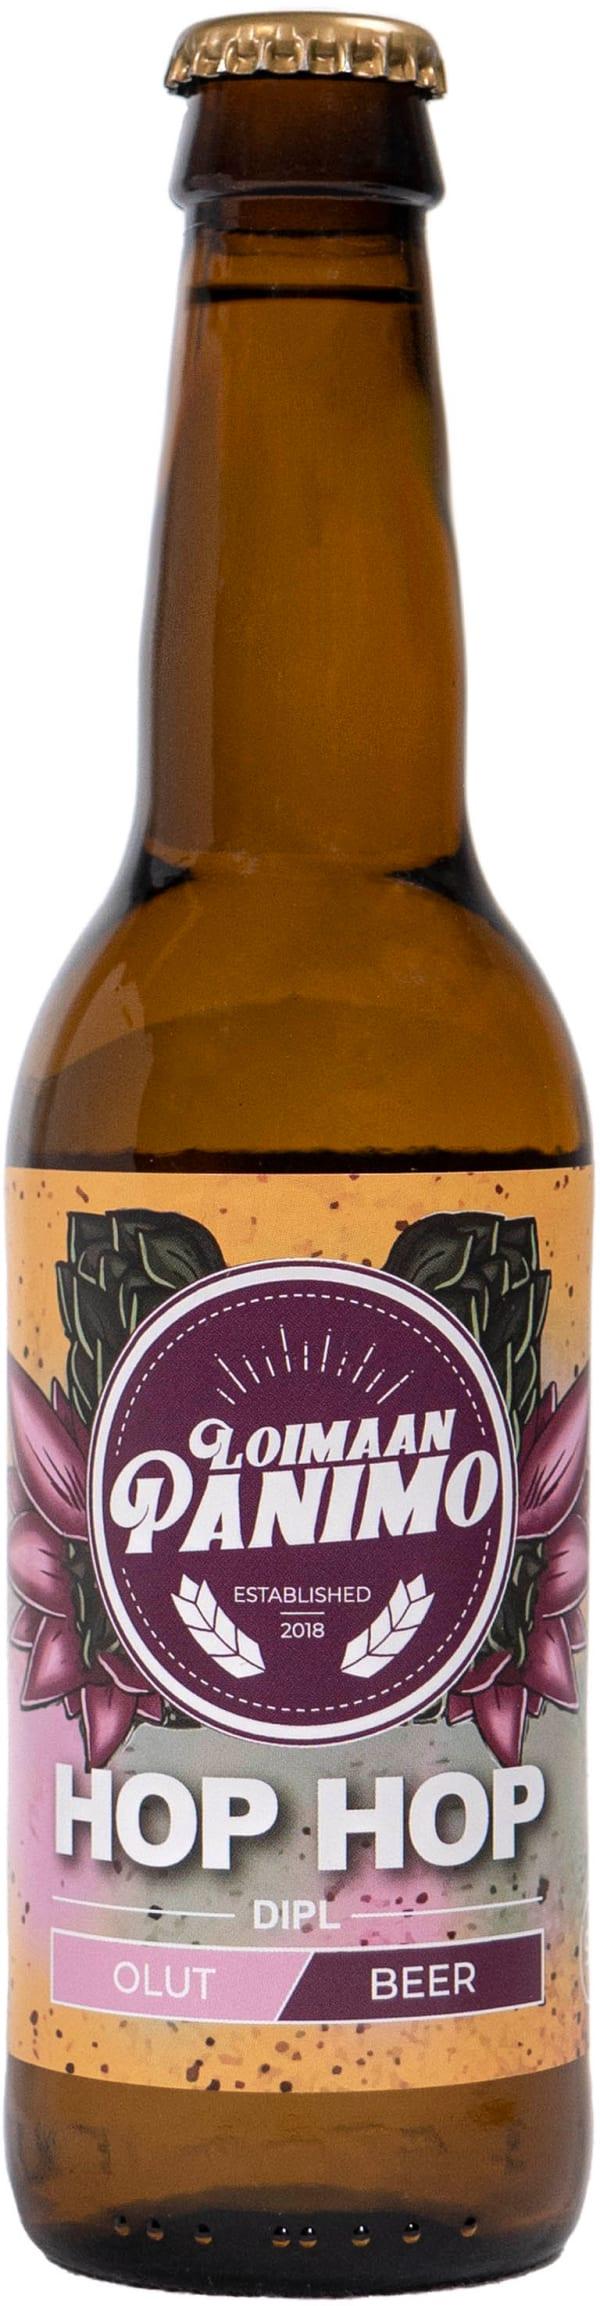 Loimaan Hop Hop DIPL